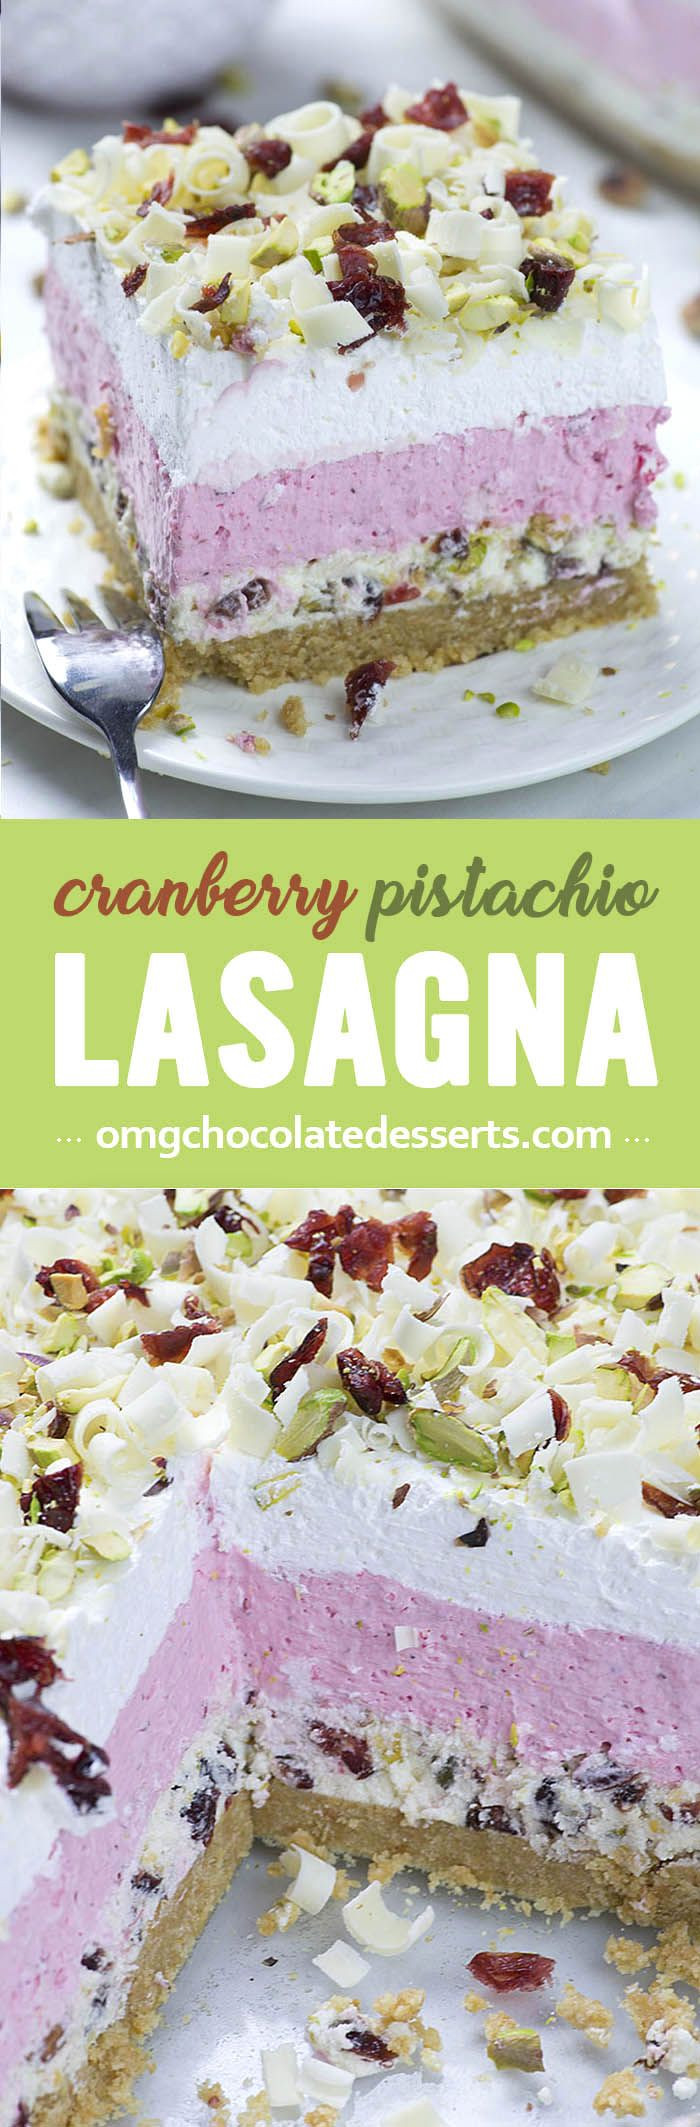 Easy Christmas Desserts Pinterest  Cranberry Pistachio Lasagna is easy NO BAKE dessert for